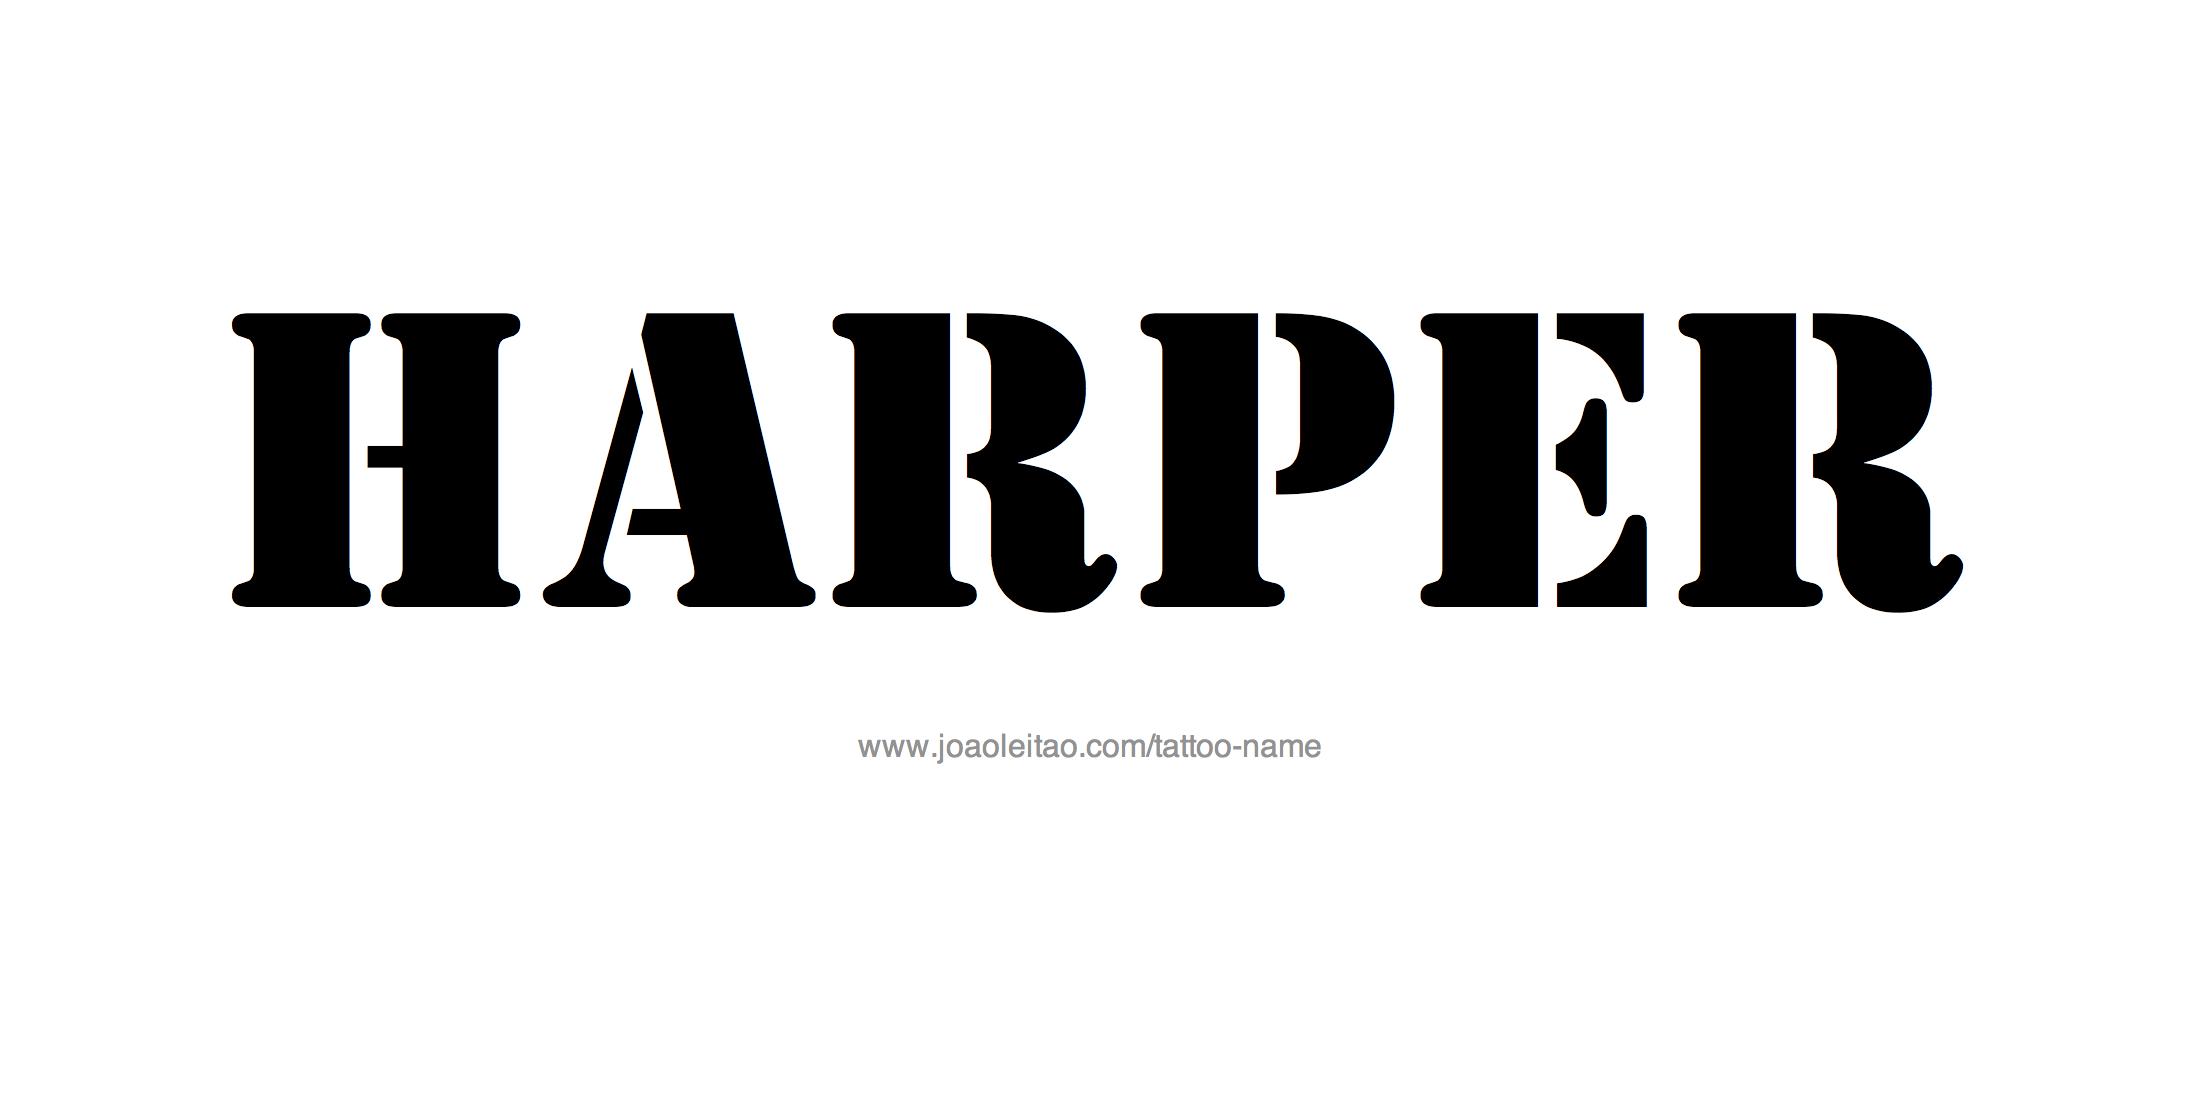 Name: Harper Name Tattoo Designs